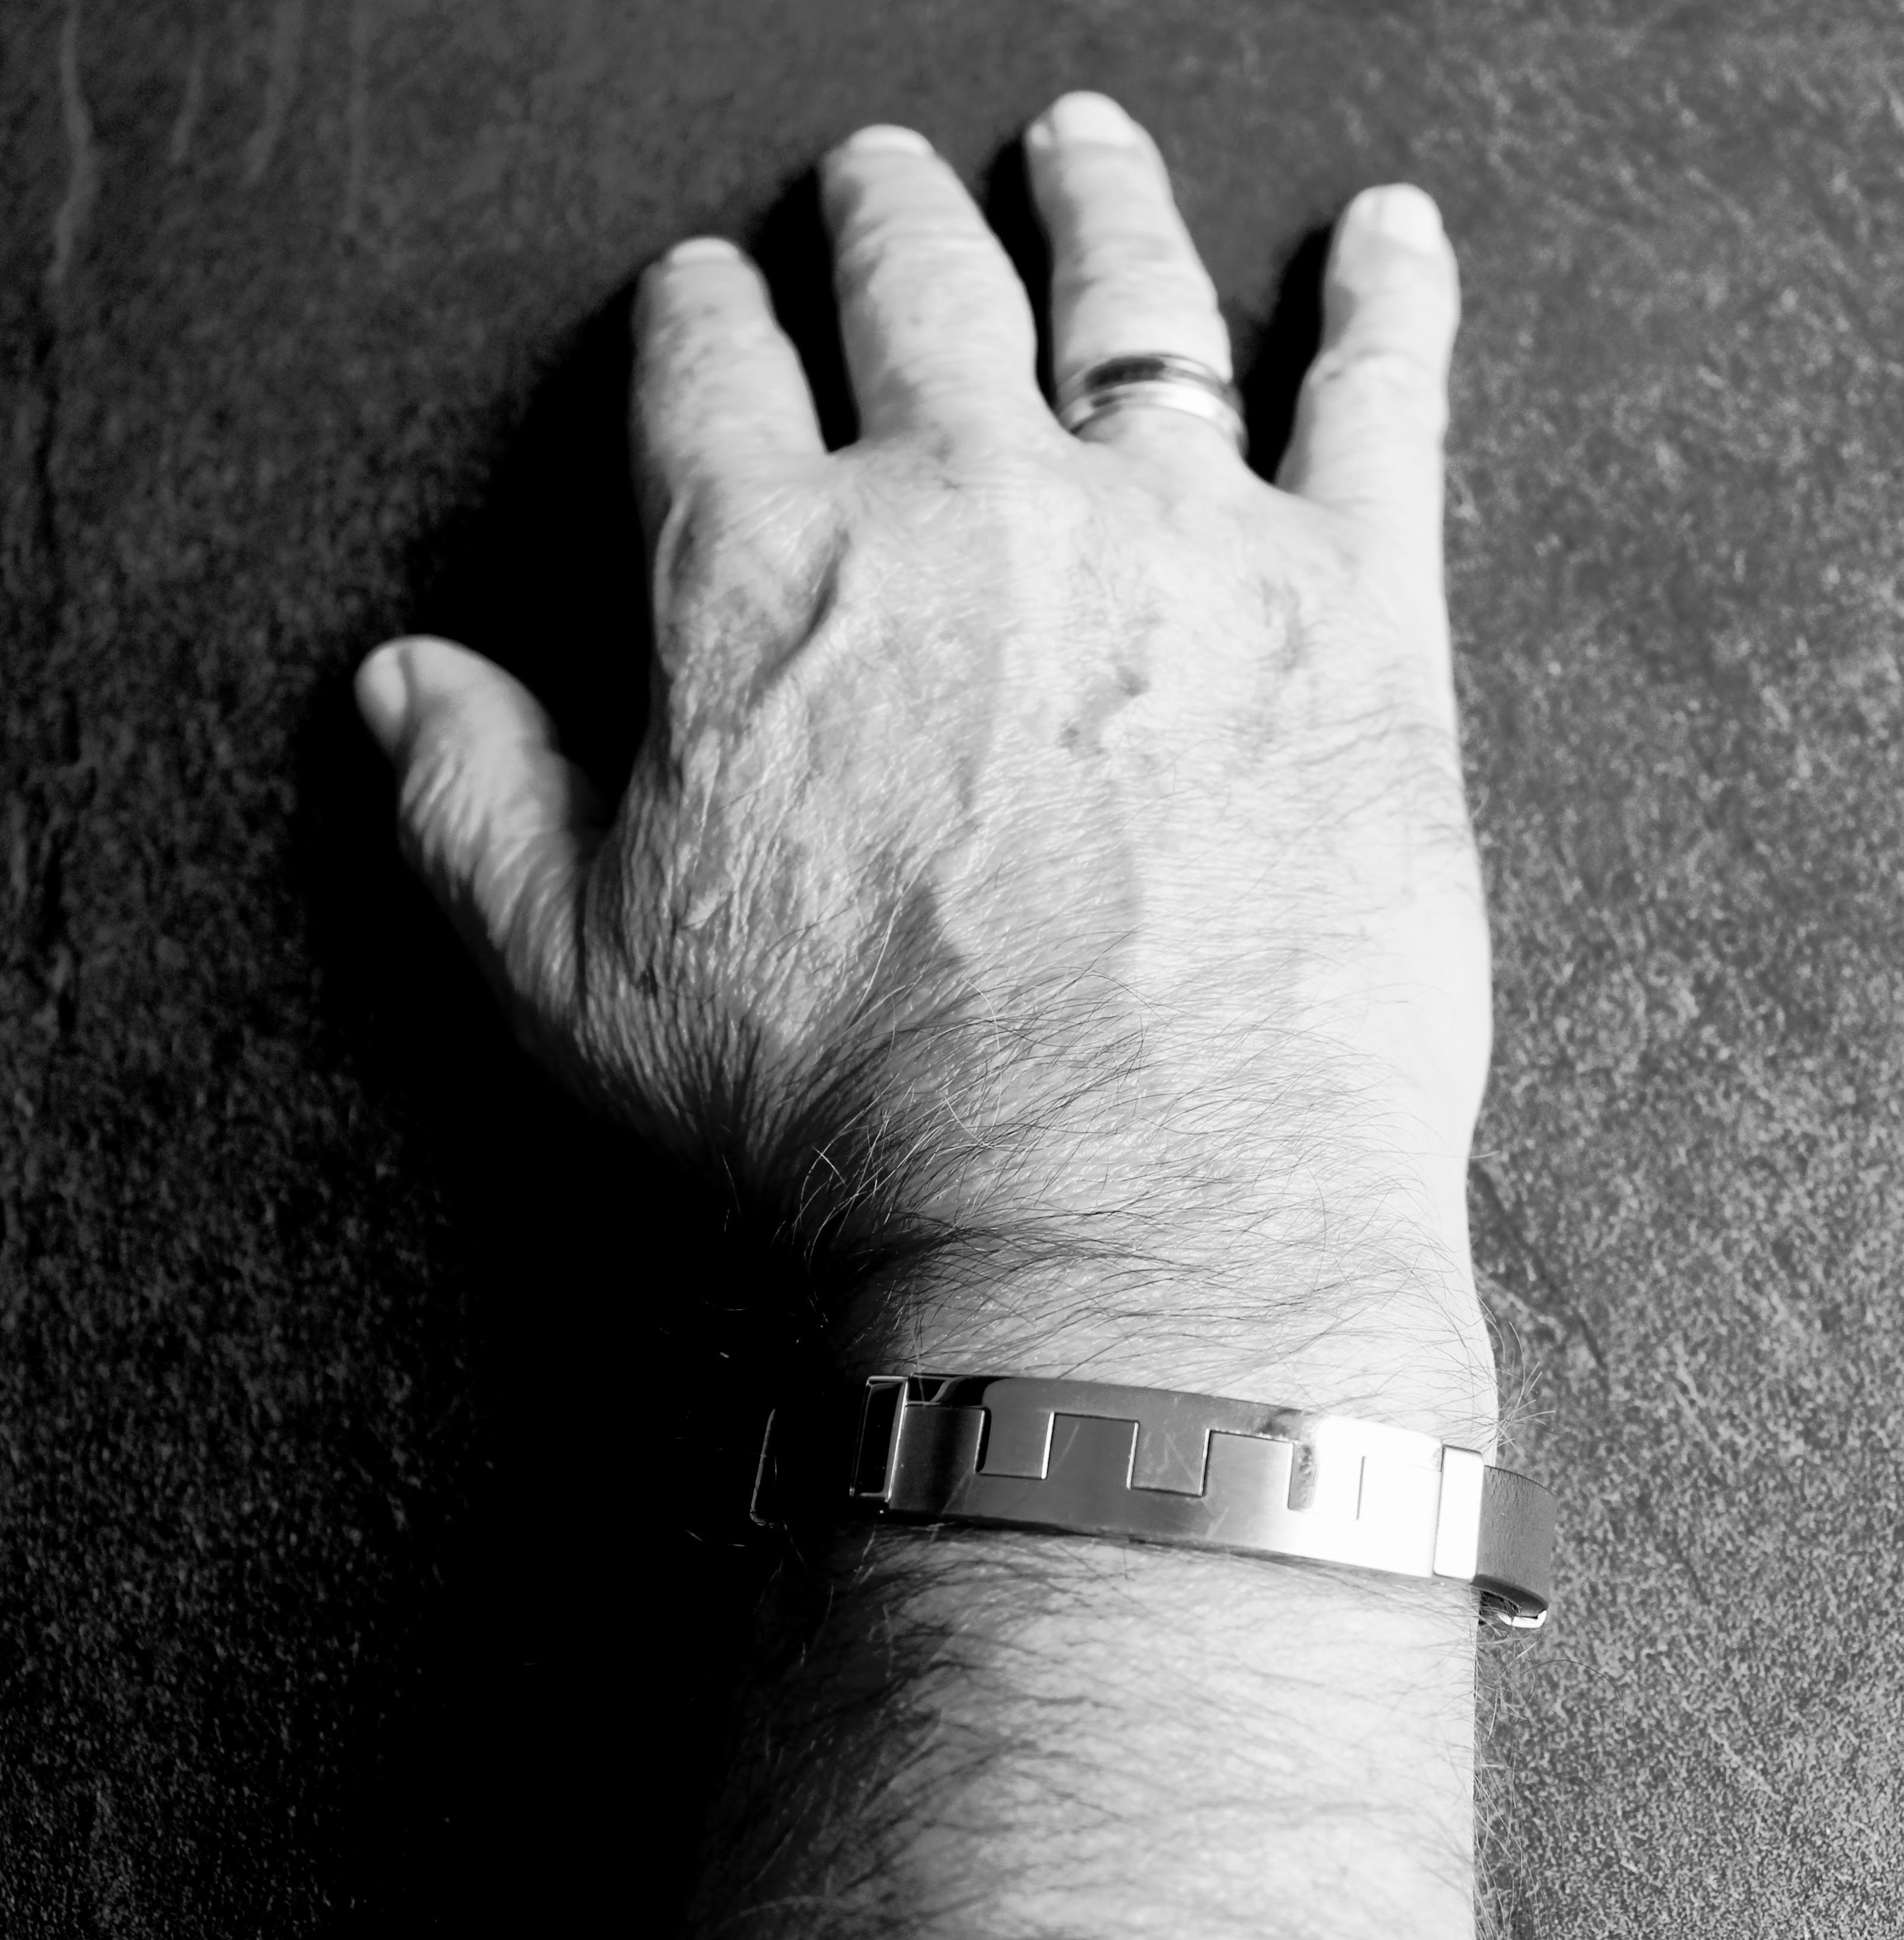 Hand Man Black And White Ring Leg Finger Monochrome Arm Bracelet Close Up Human